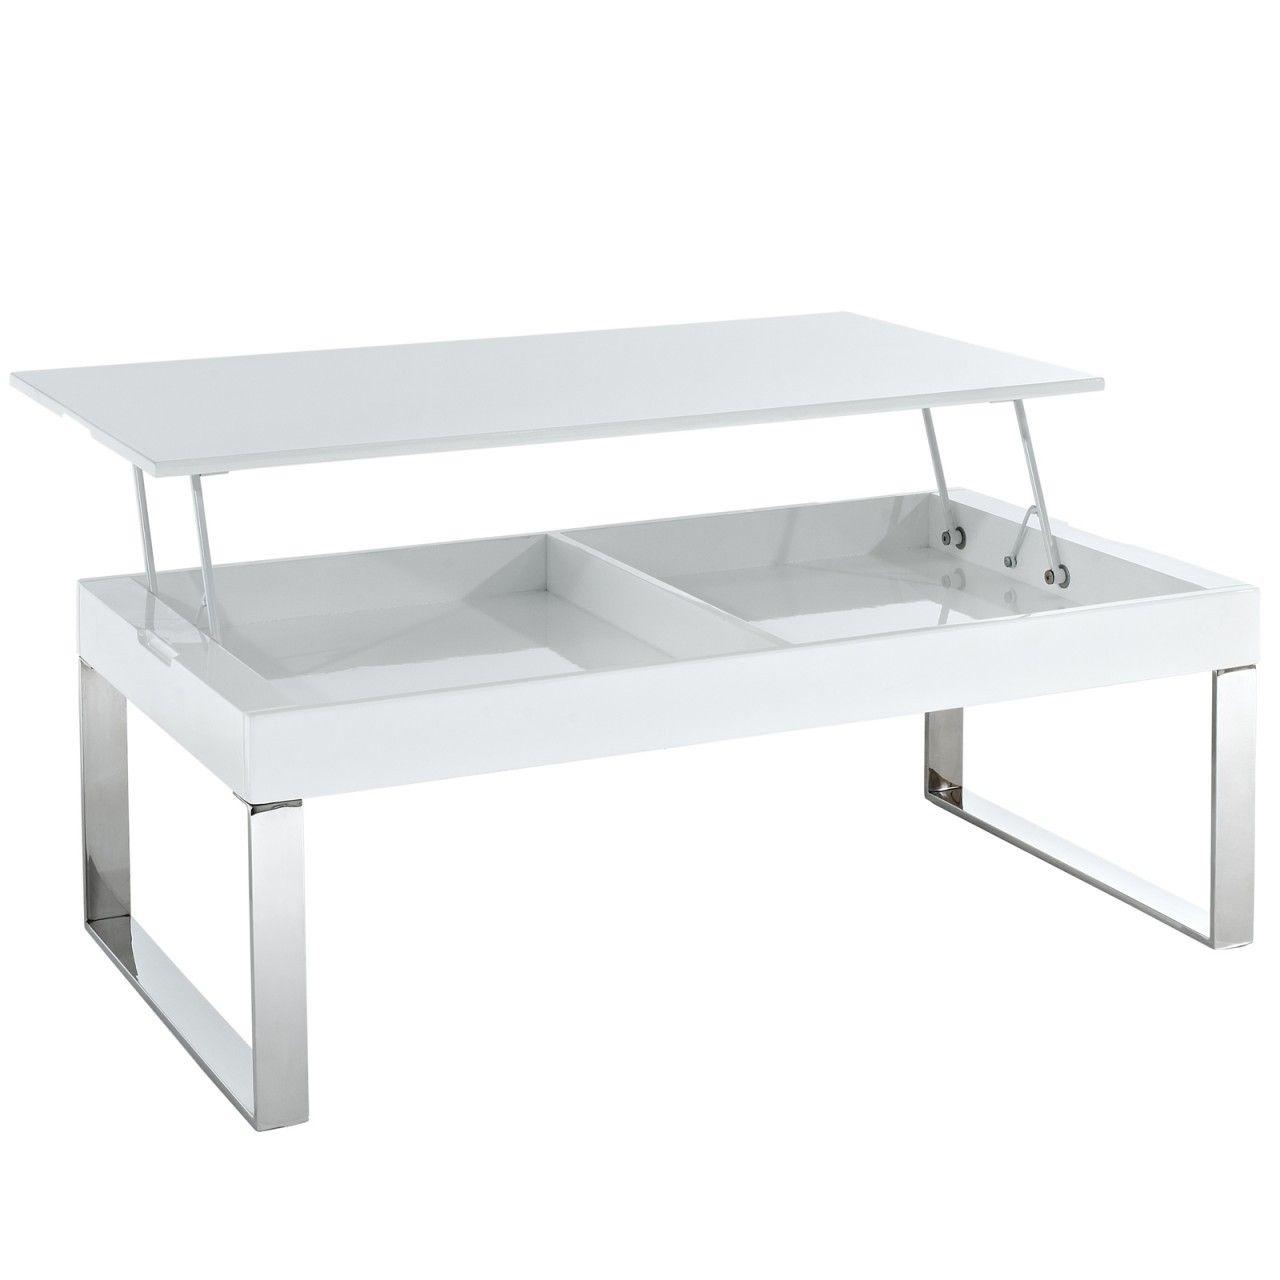 Soma Classics - White Gloss Lift Table, $289.99 (http://www.somaclassics.com/white-gloss-lift-table/)